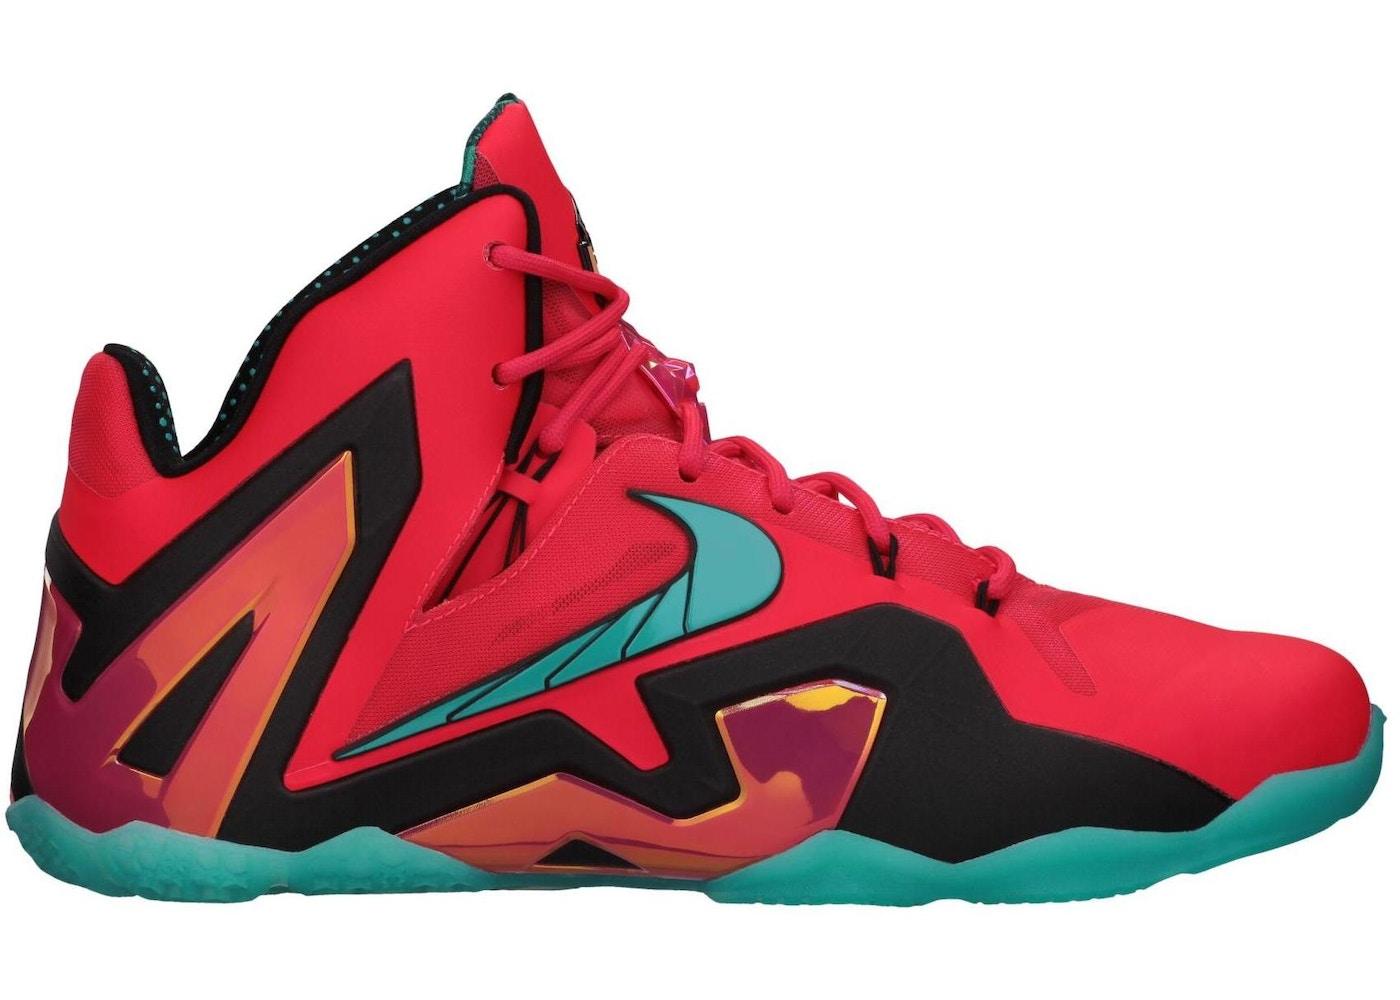 40babae0a21 Nike LeBron 11 Shoes - Average Sale Price